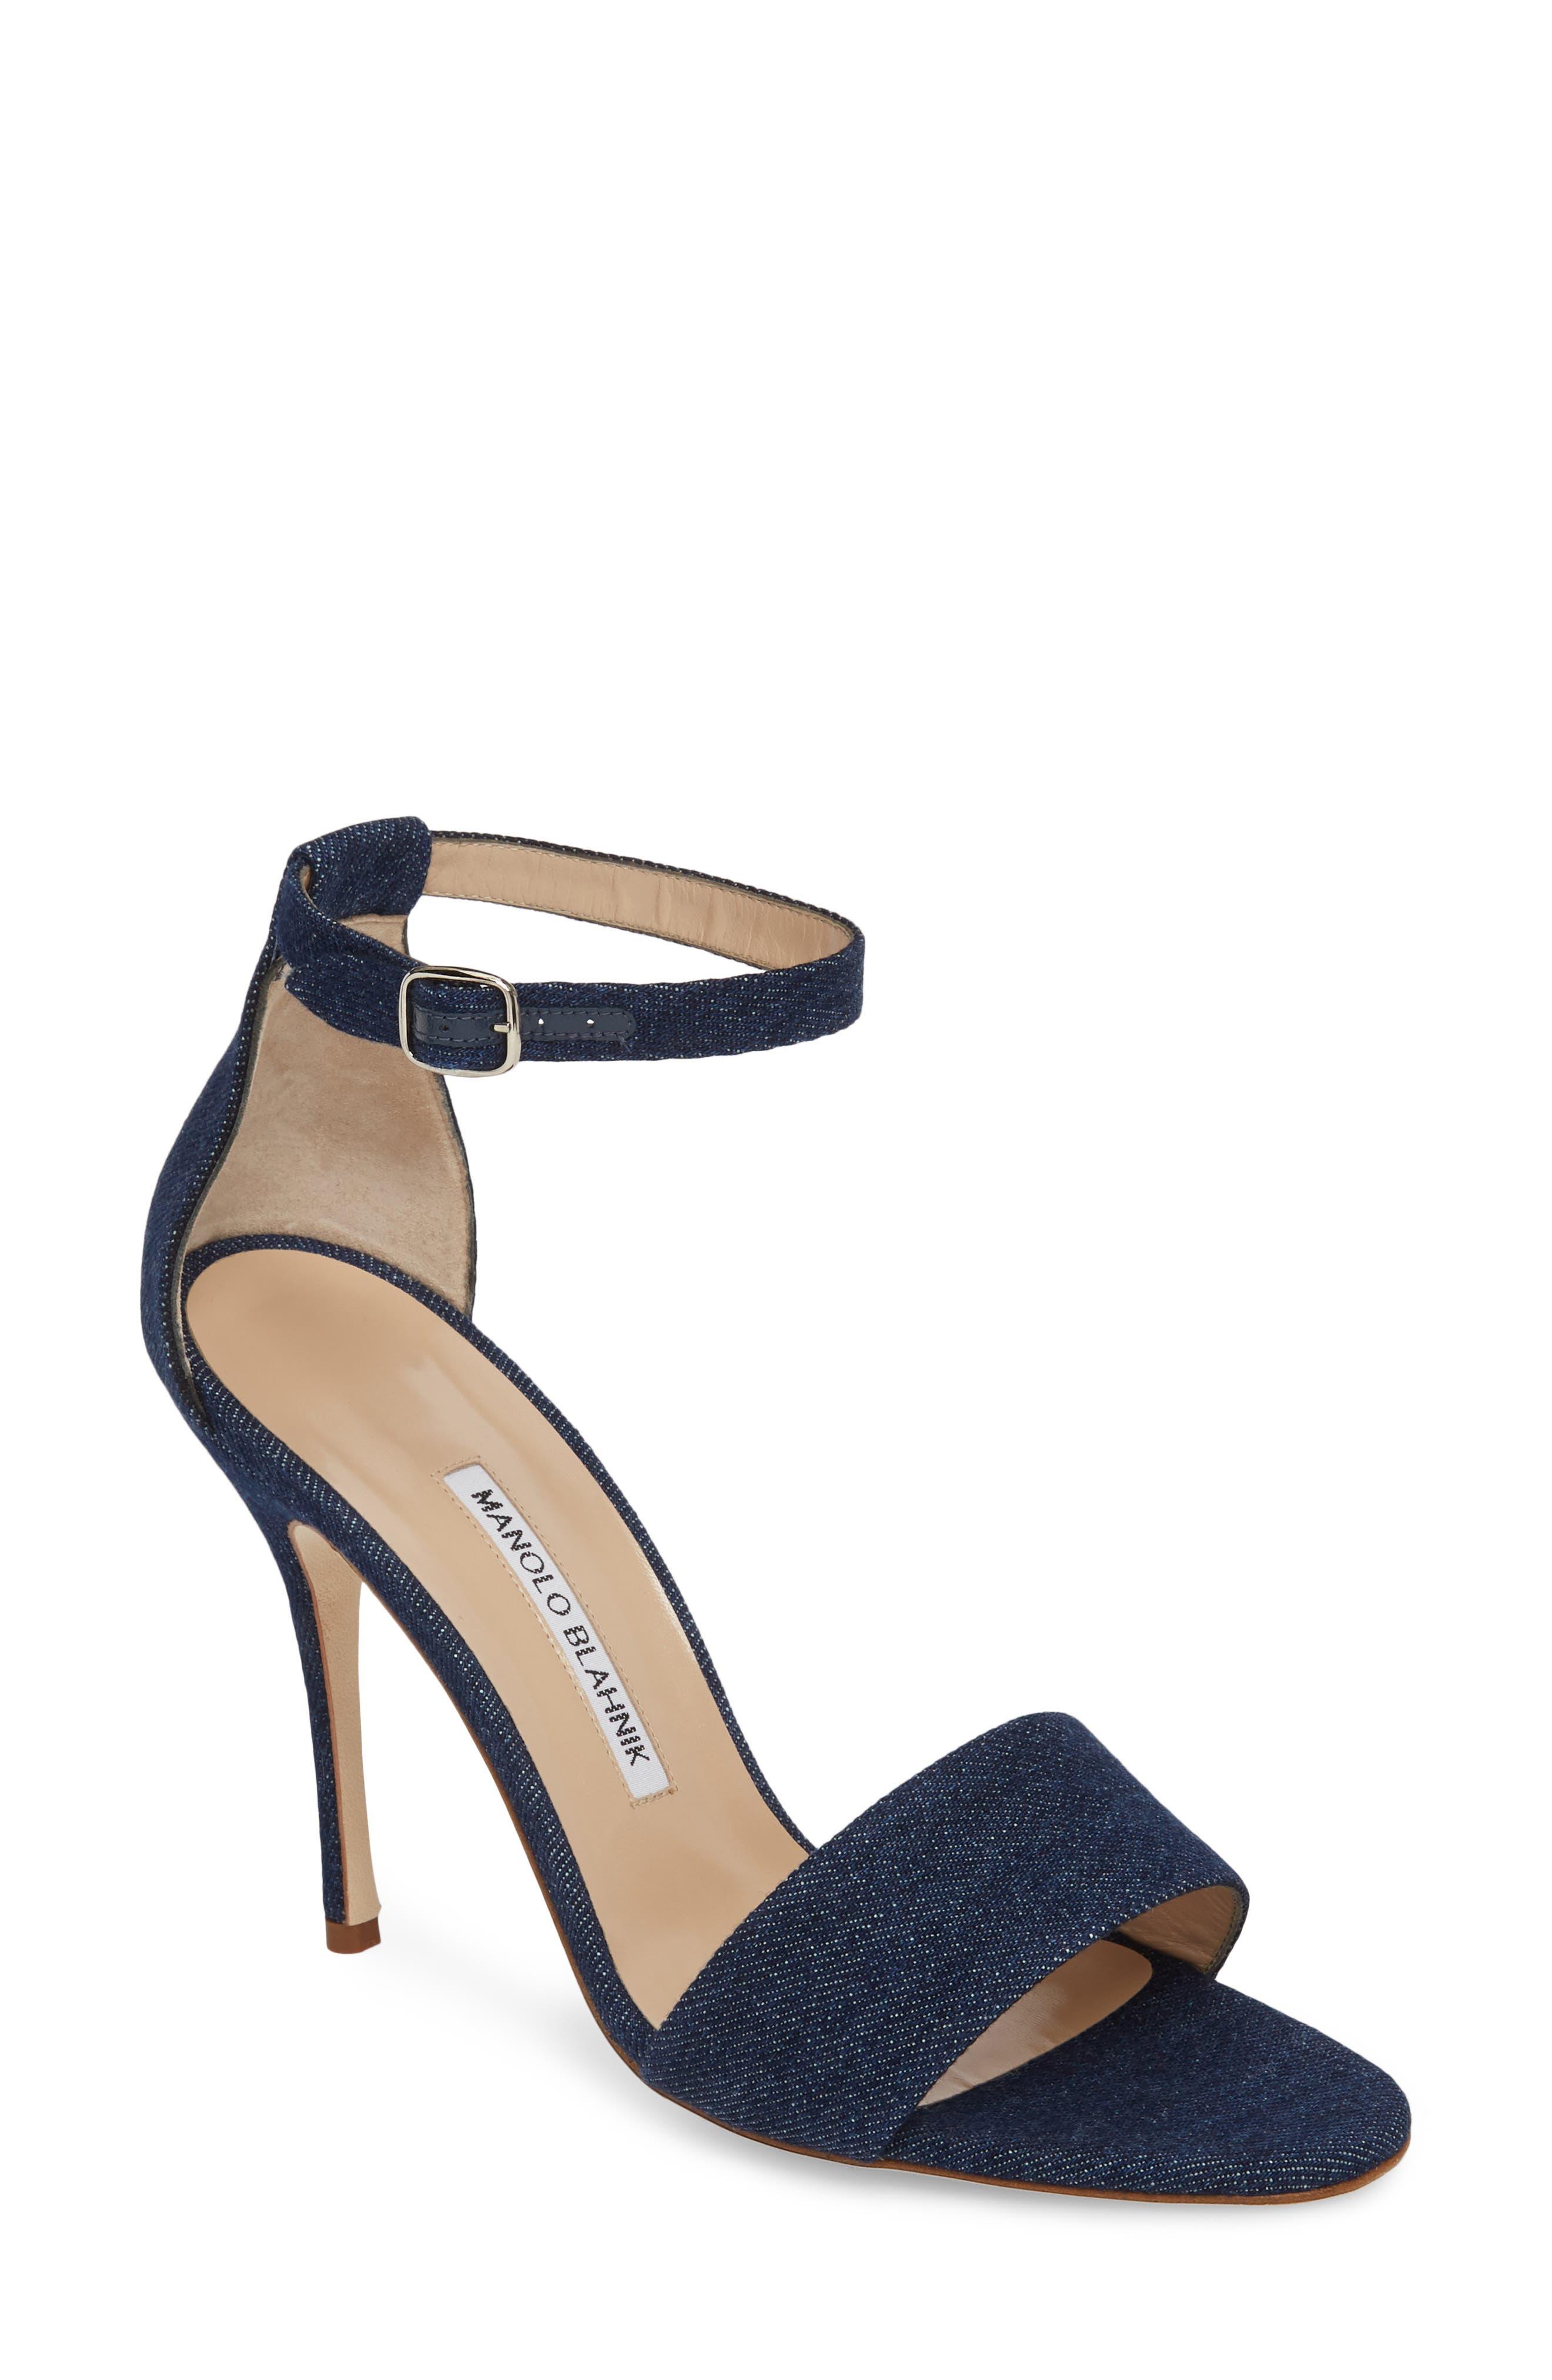 Tres Ankle Strap Sandal,                         Main,                         color, DENIM BLUE